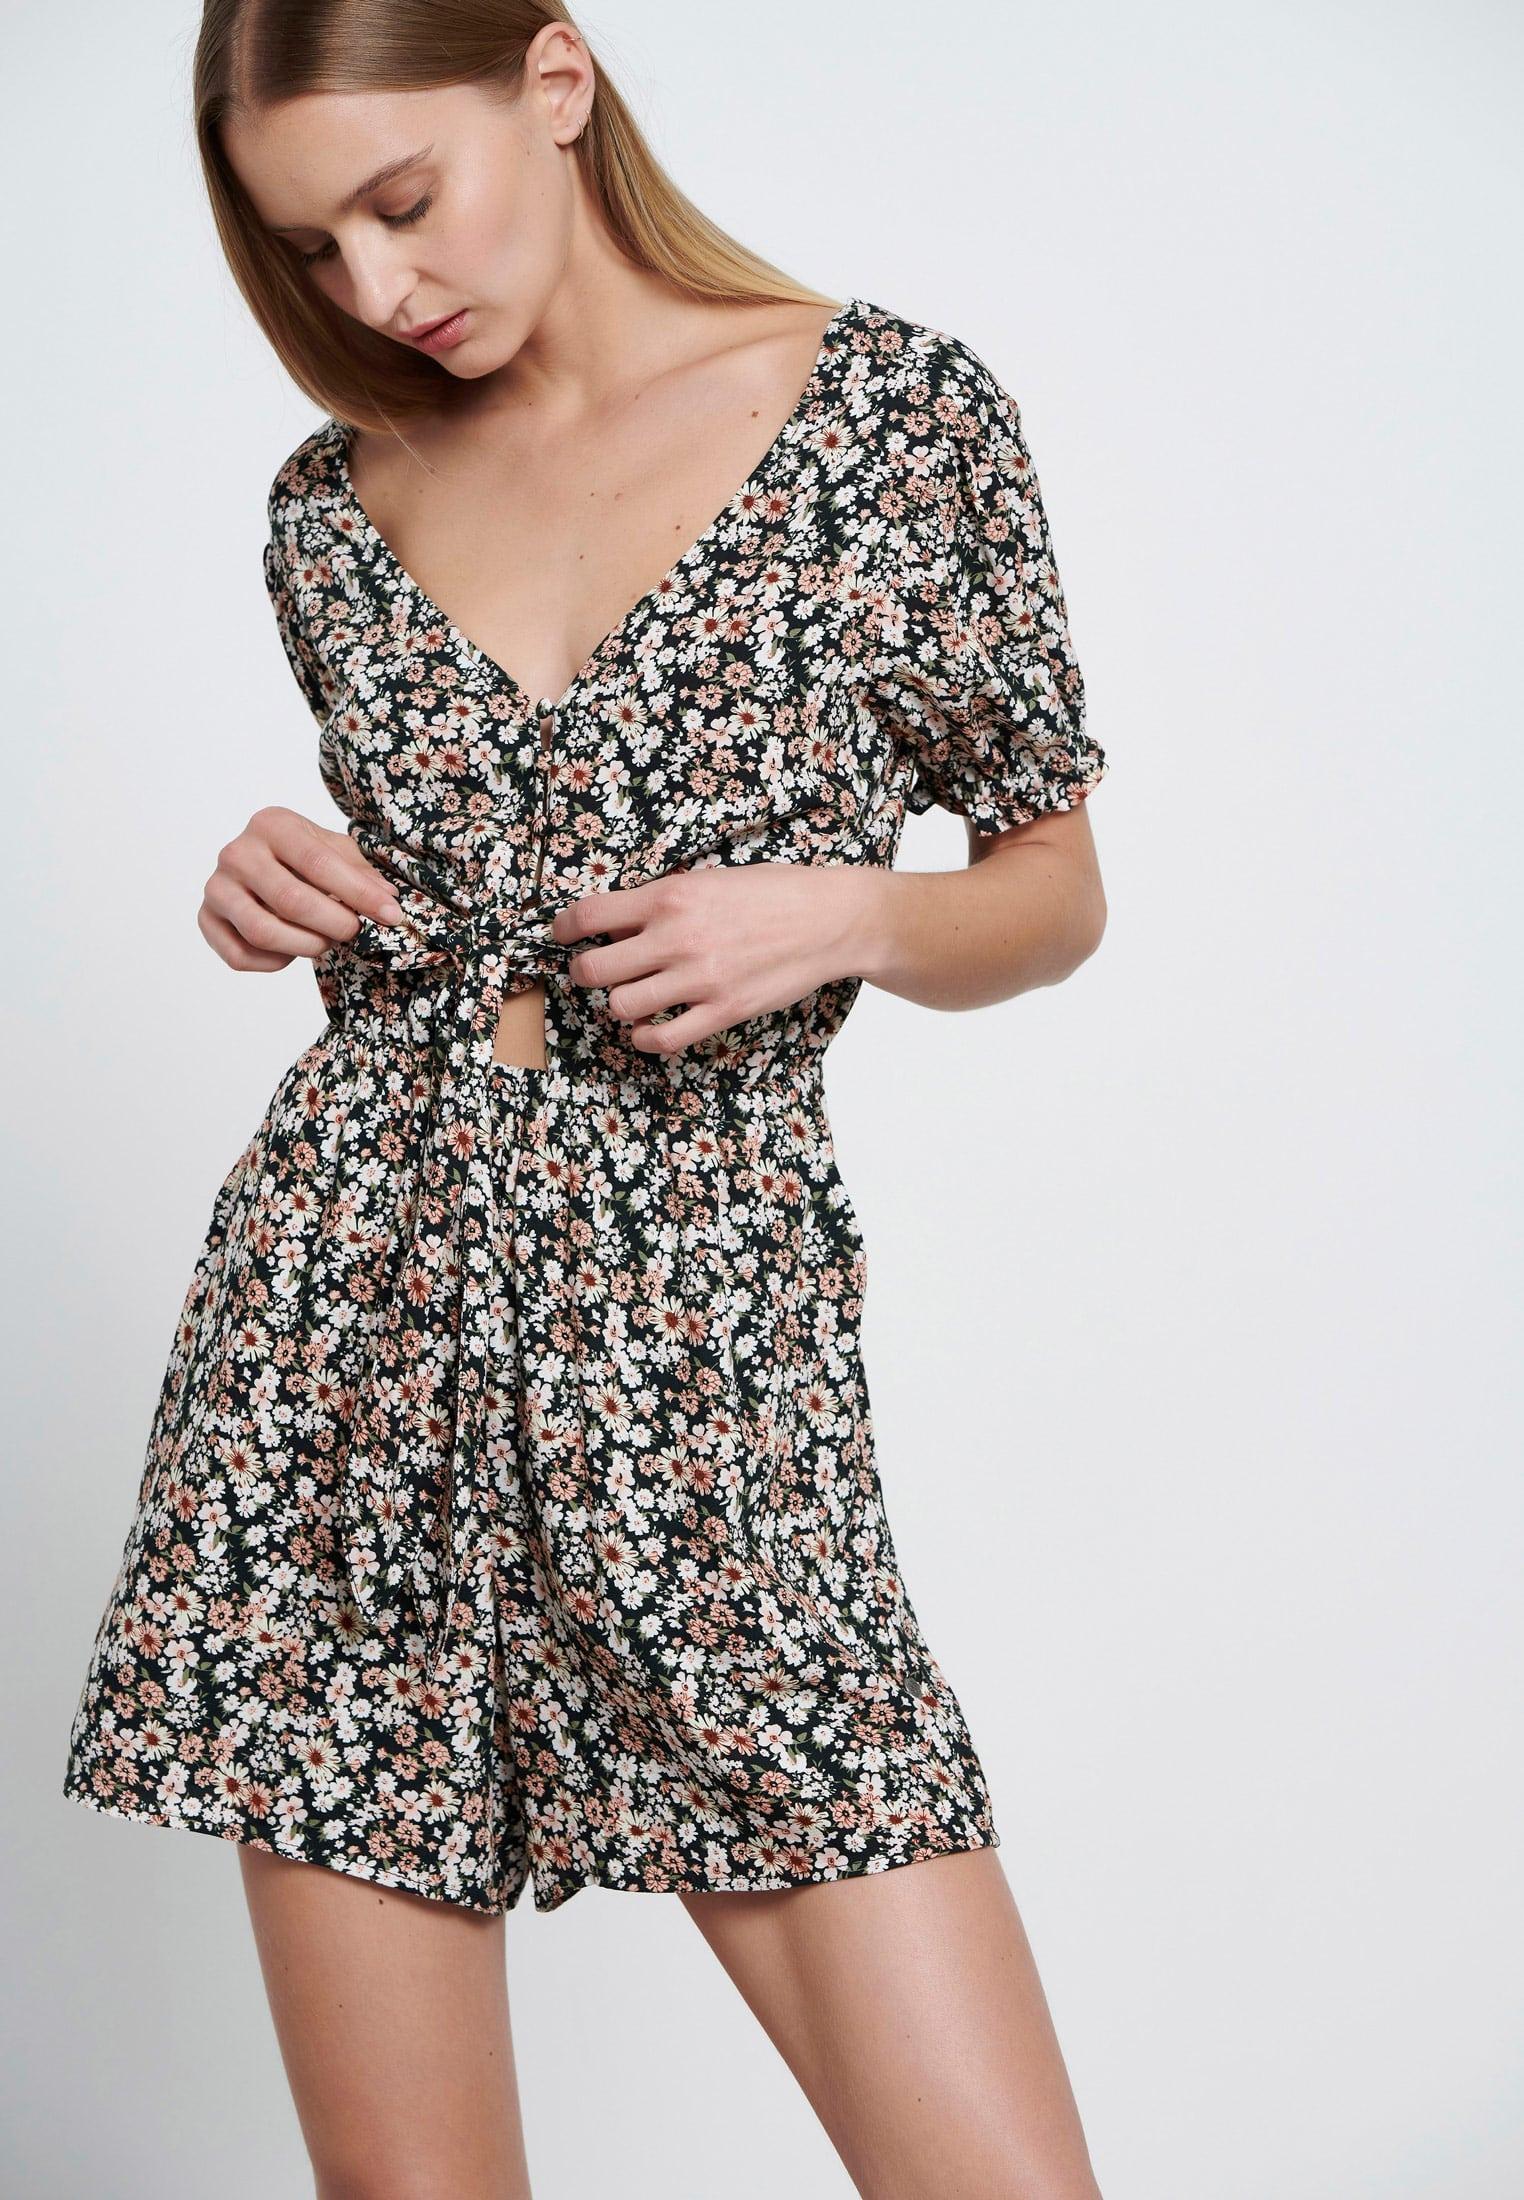 Viscose ολόσωμη φόρμα με floral τύπωμα